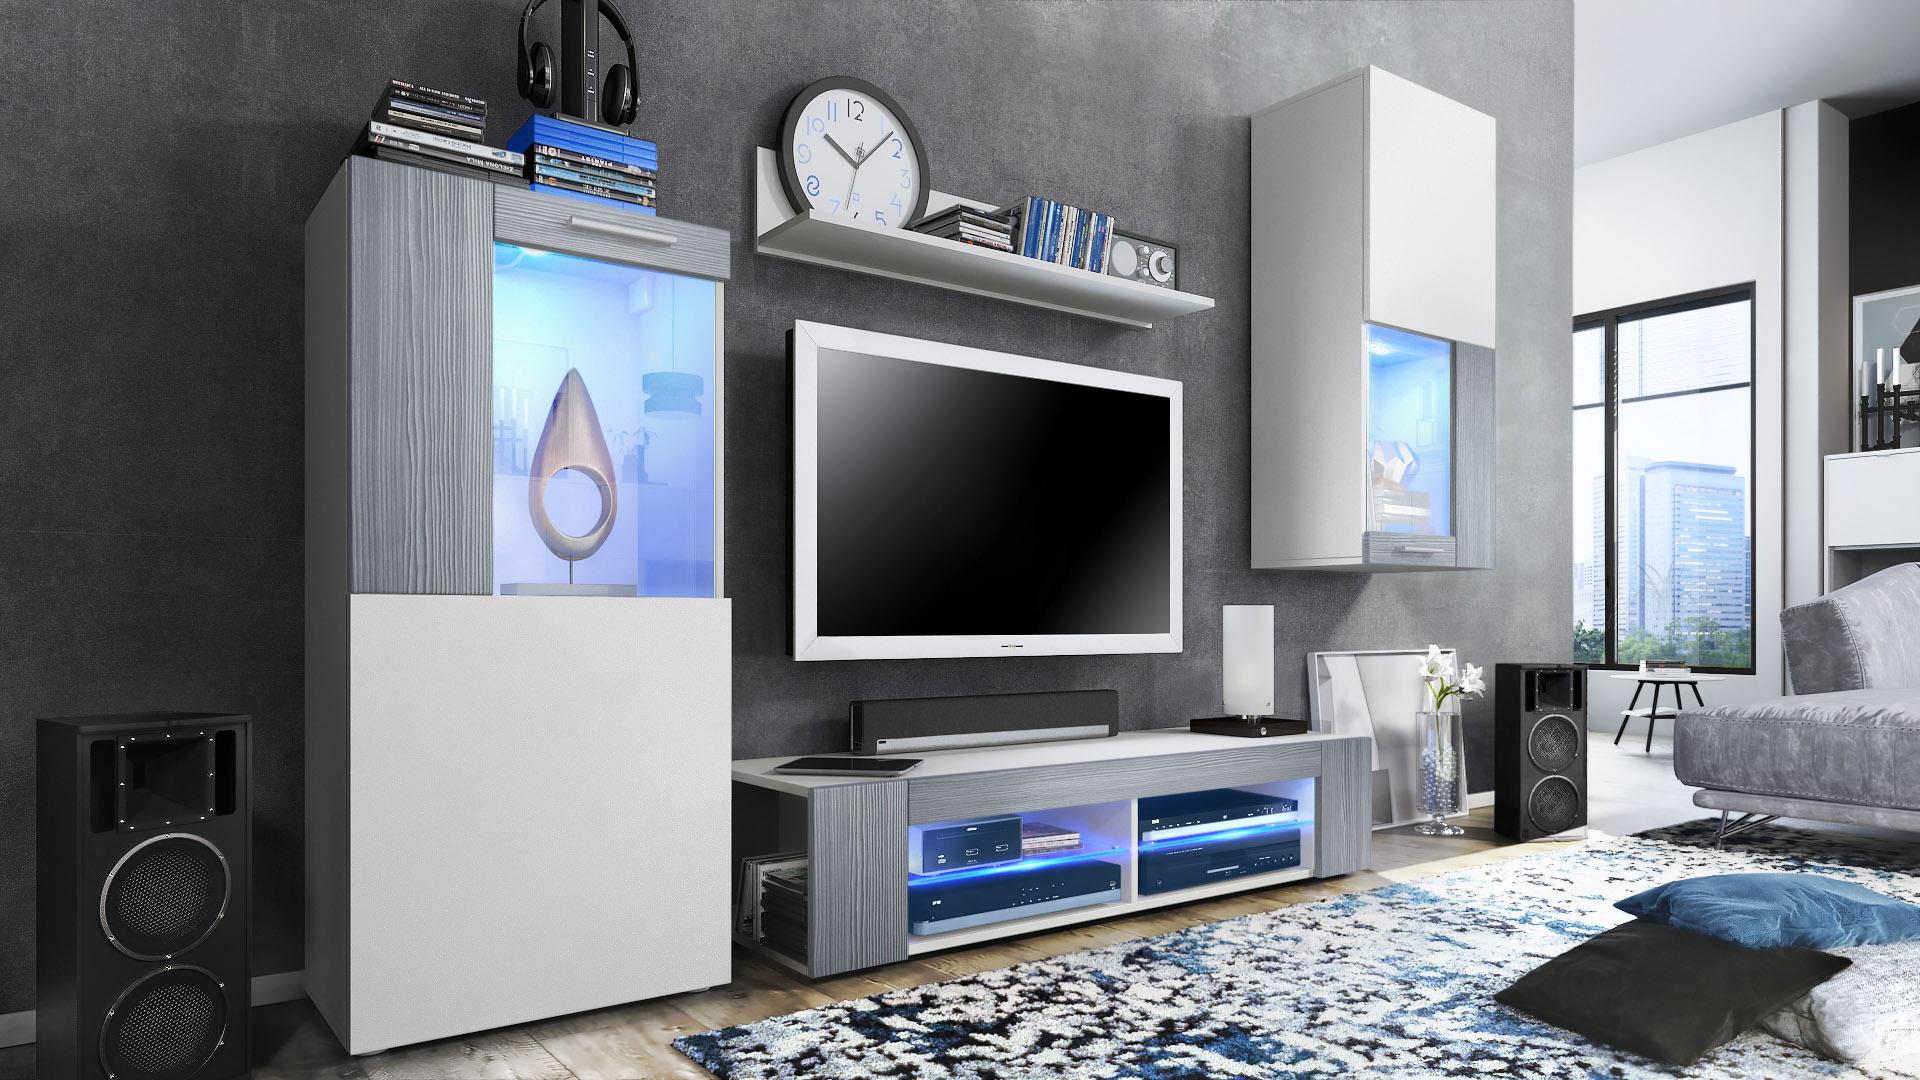 Combinaison Murale Vitrine Meuble Tv Armoire Basse Movie Blanc  # Combinaison Murale Meuble Tv